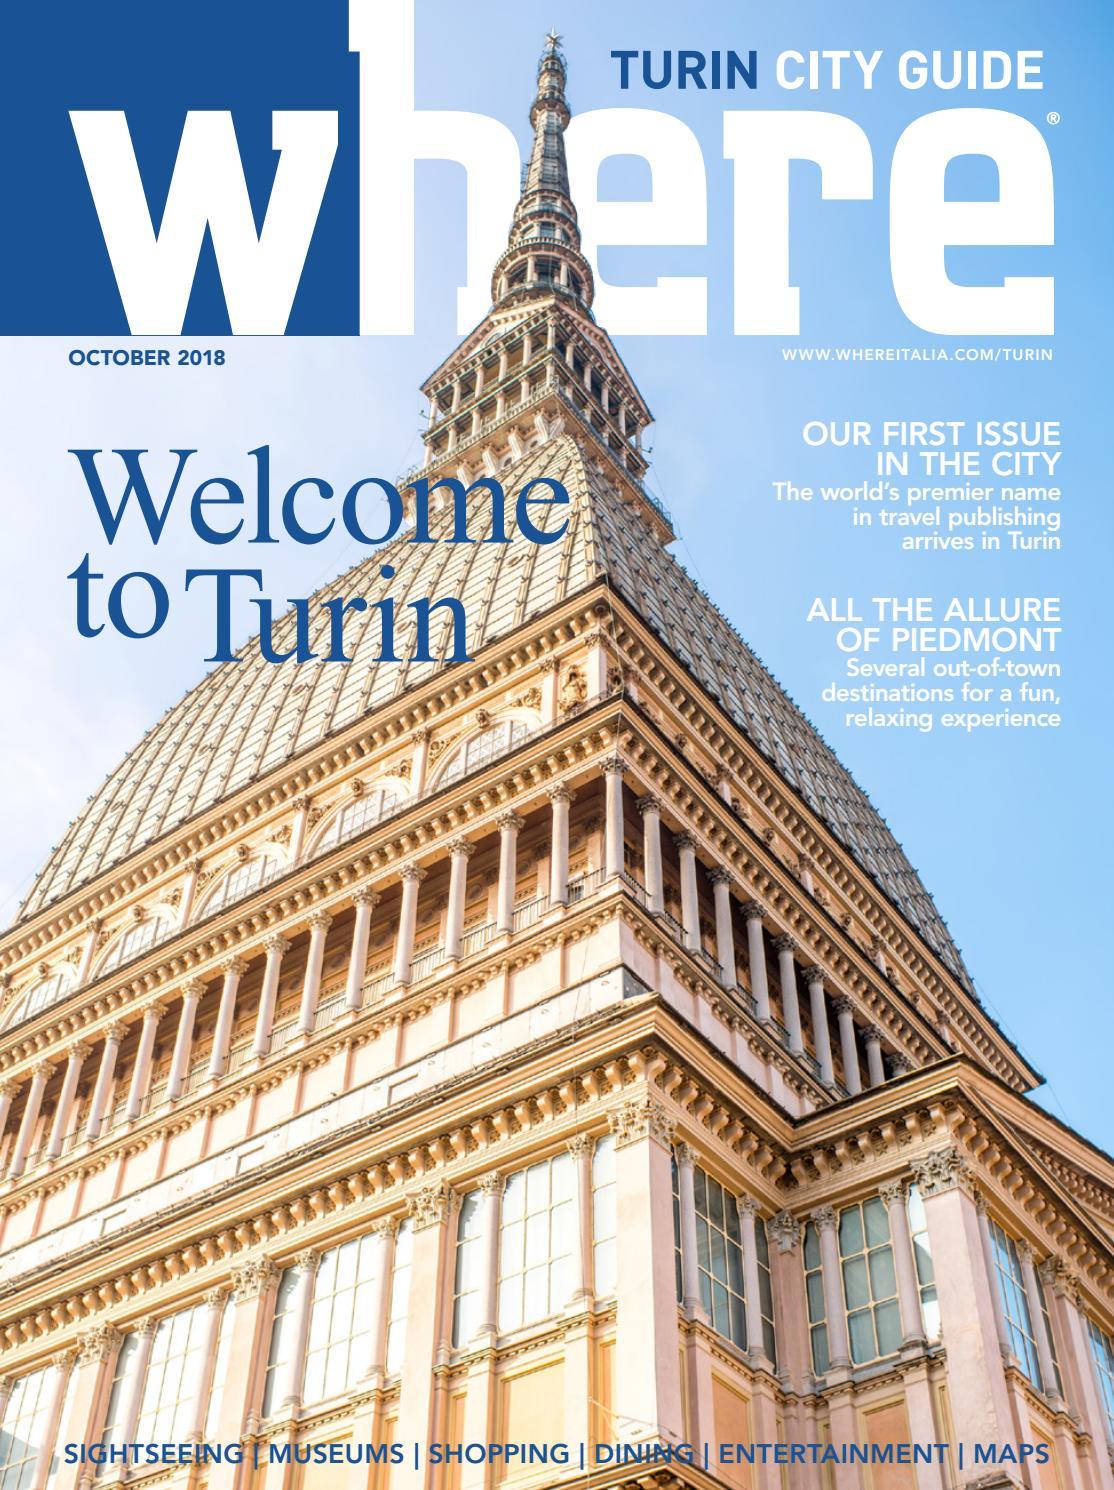 f5a8d0f3702b Where Turin n 1 October 2018 by Where Italia - issuu